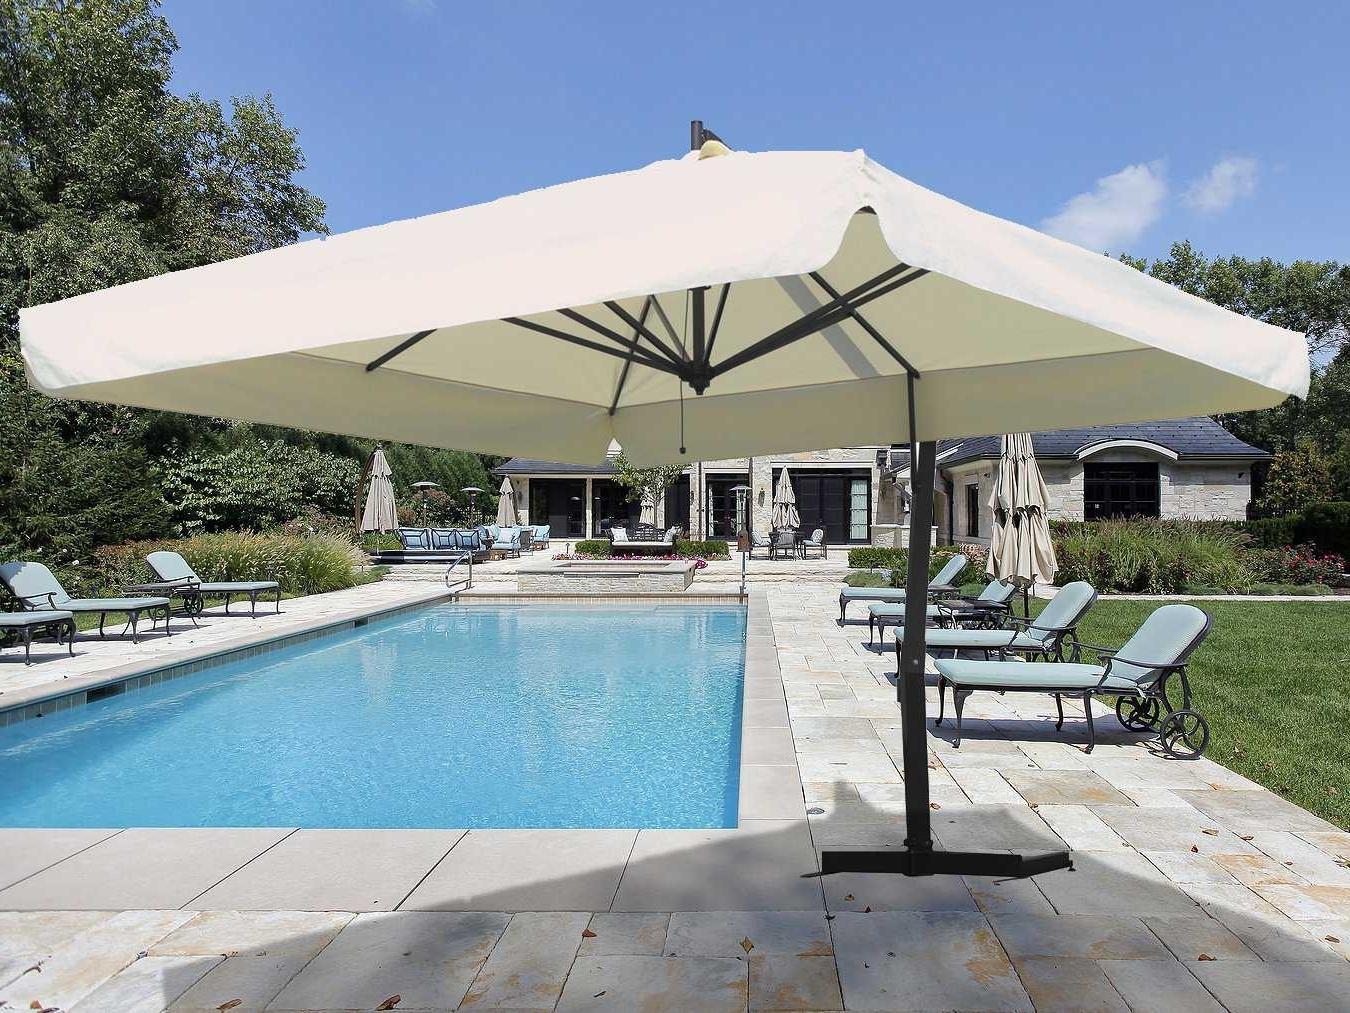 Outdoor: Impressive Patio Cantilever Umbrella Offset Patio Umbrellas With Recent Cantilever Patio Umbrellas (View 16 of 20)